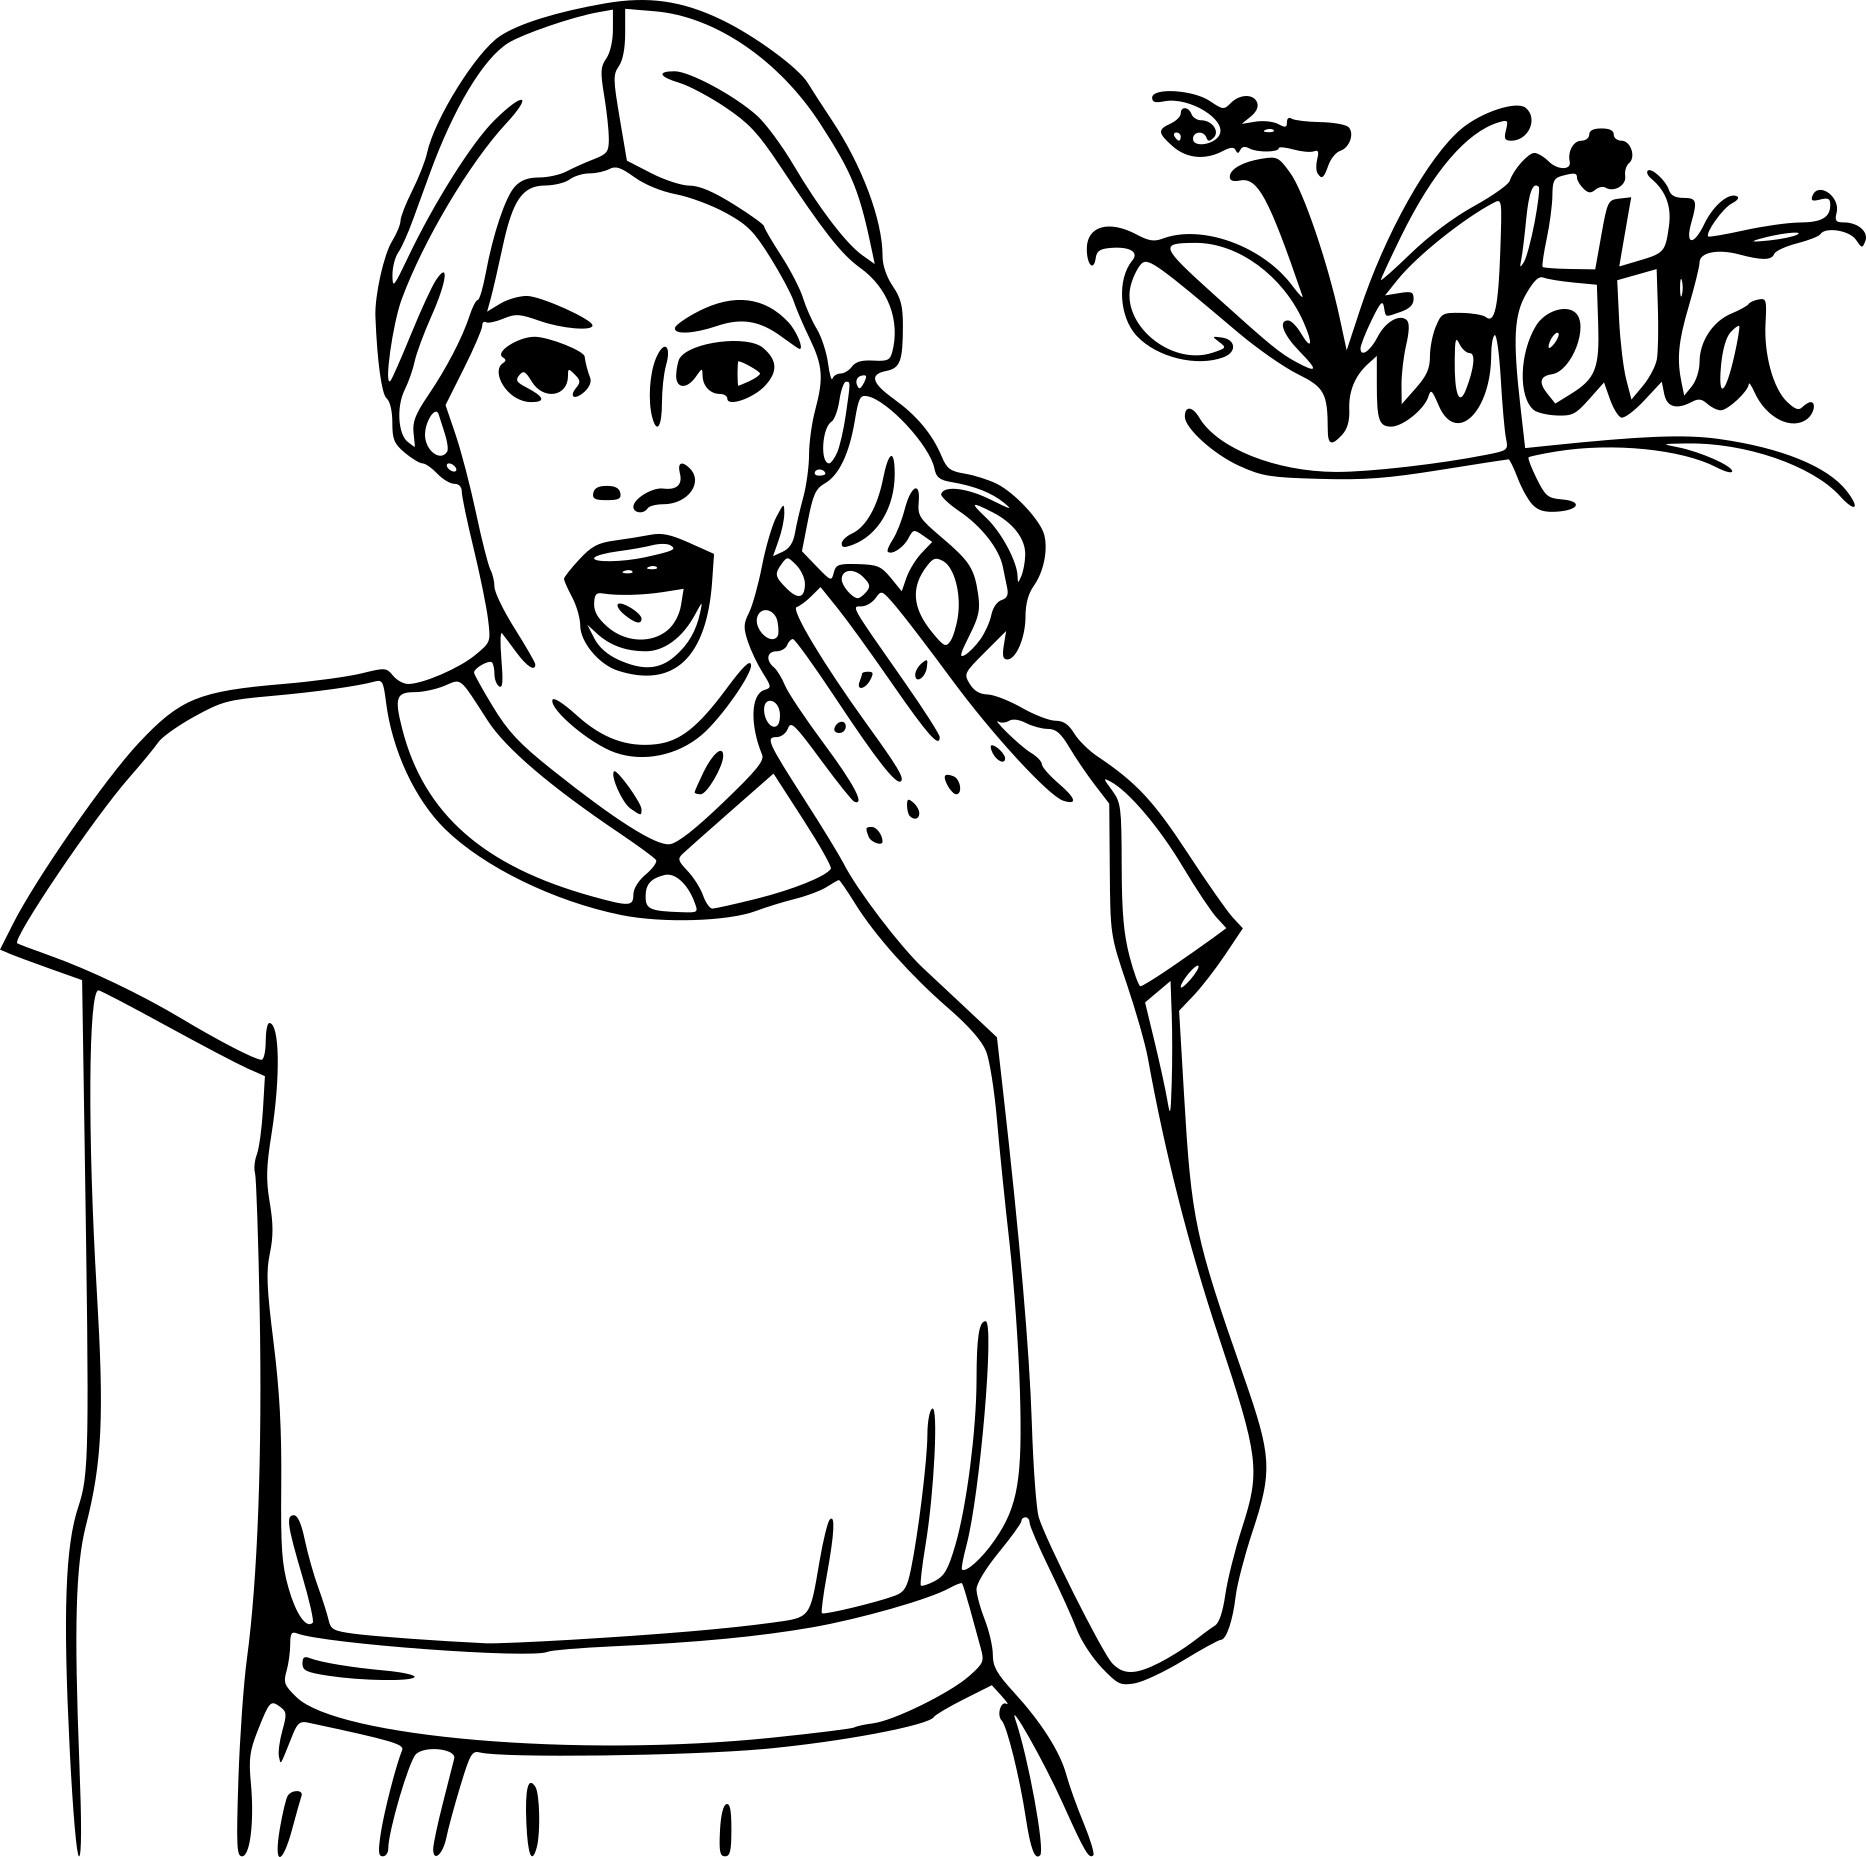 Coloriage Violetta Et Dessin À Imprimer encequiconcerne Des Dessins A Imprimer